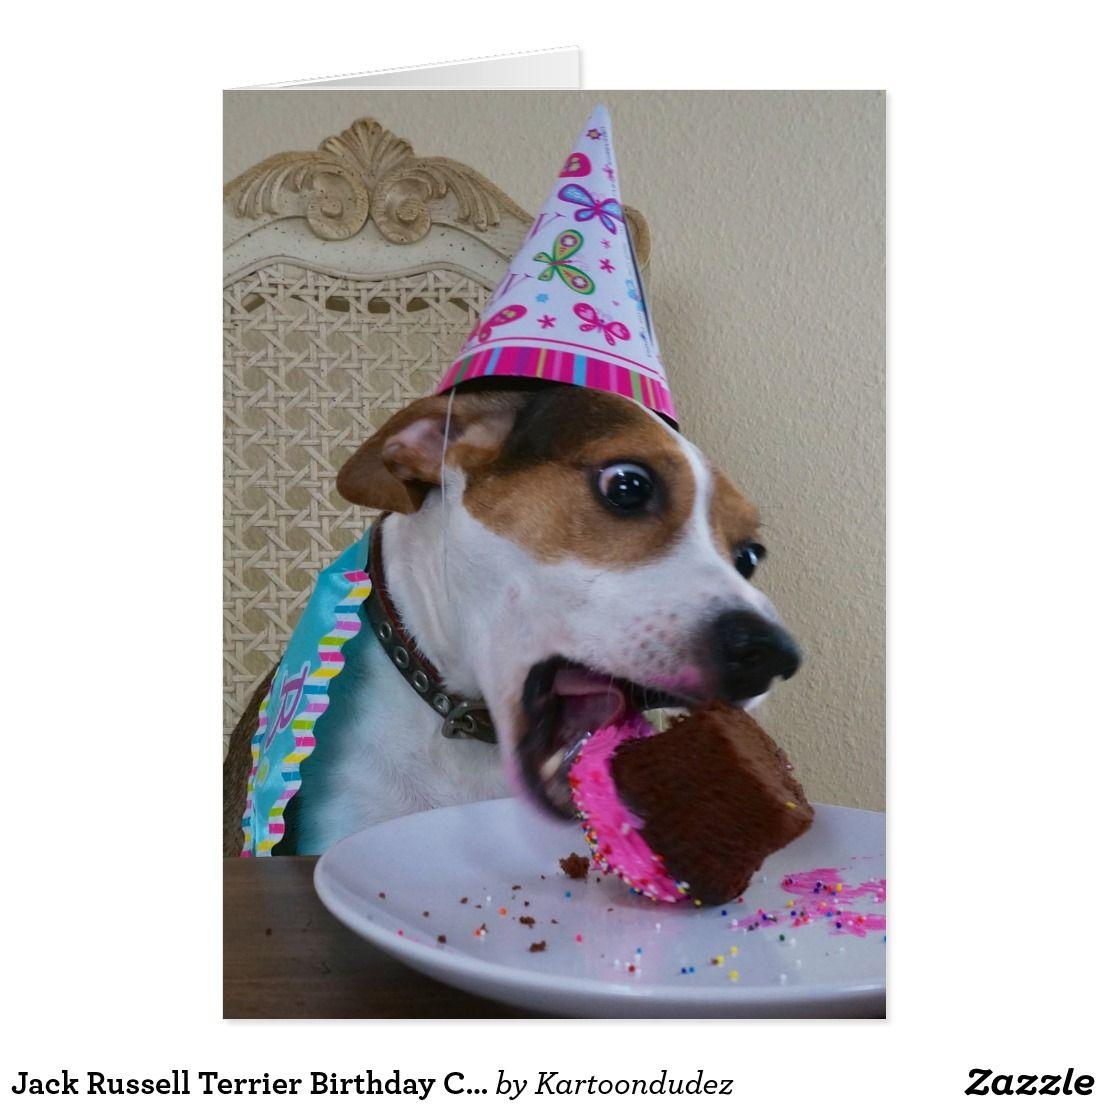 Jack Russell Terrier Birthday Card Jack Terrier Jack Russell Rat Terrier Dogs